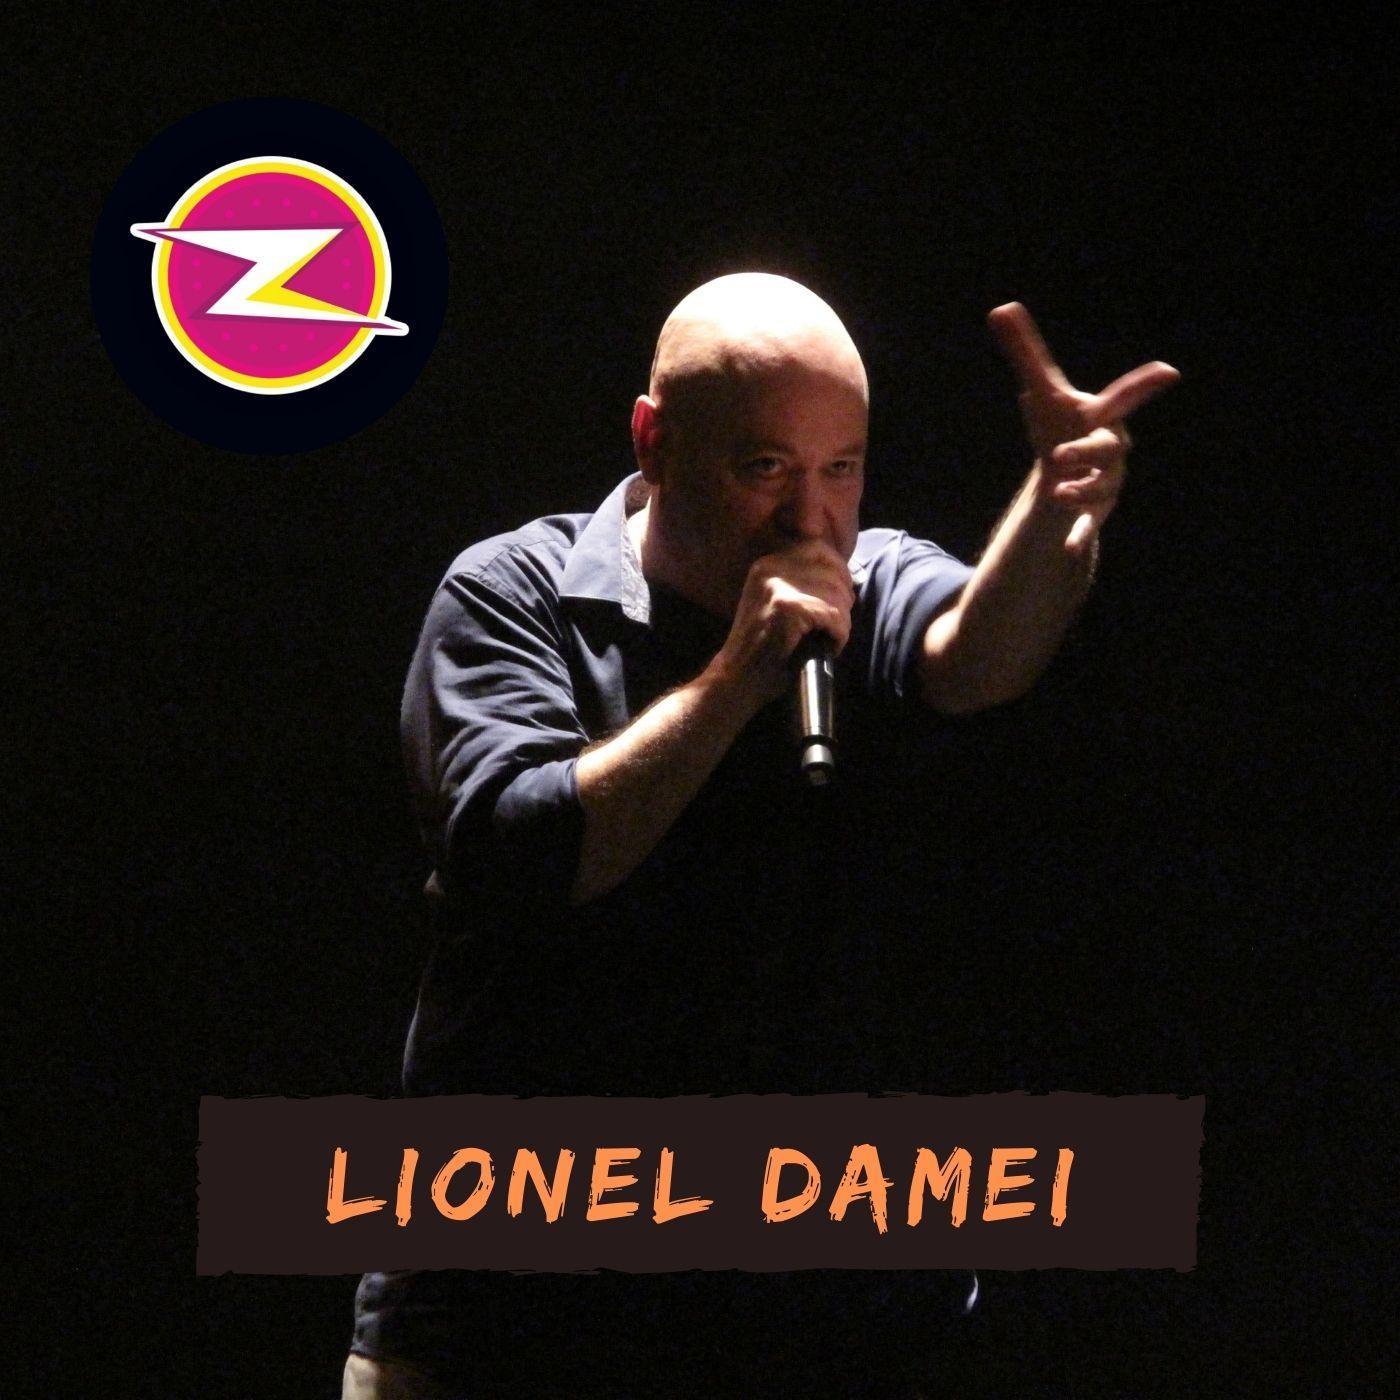 Lionel Damei